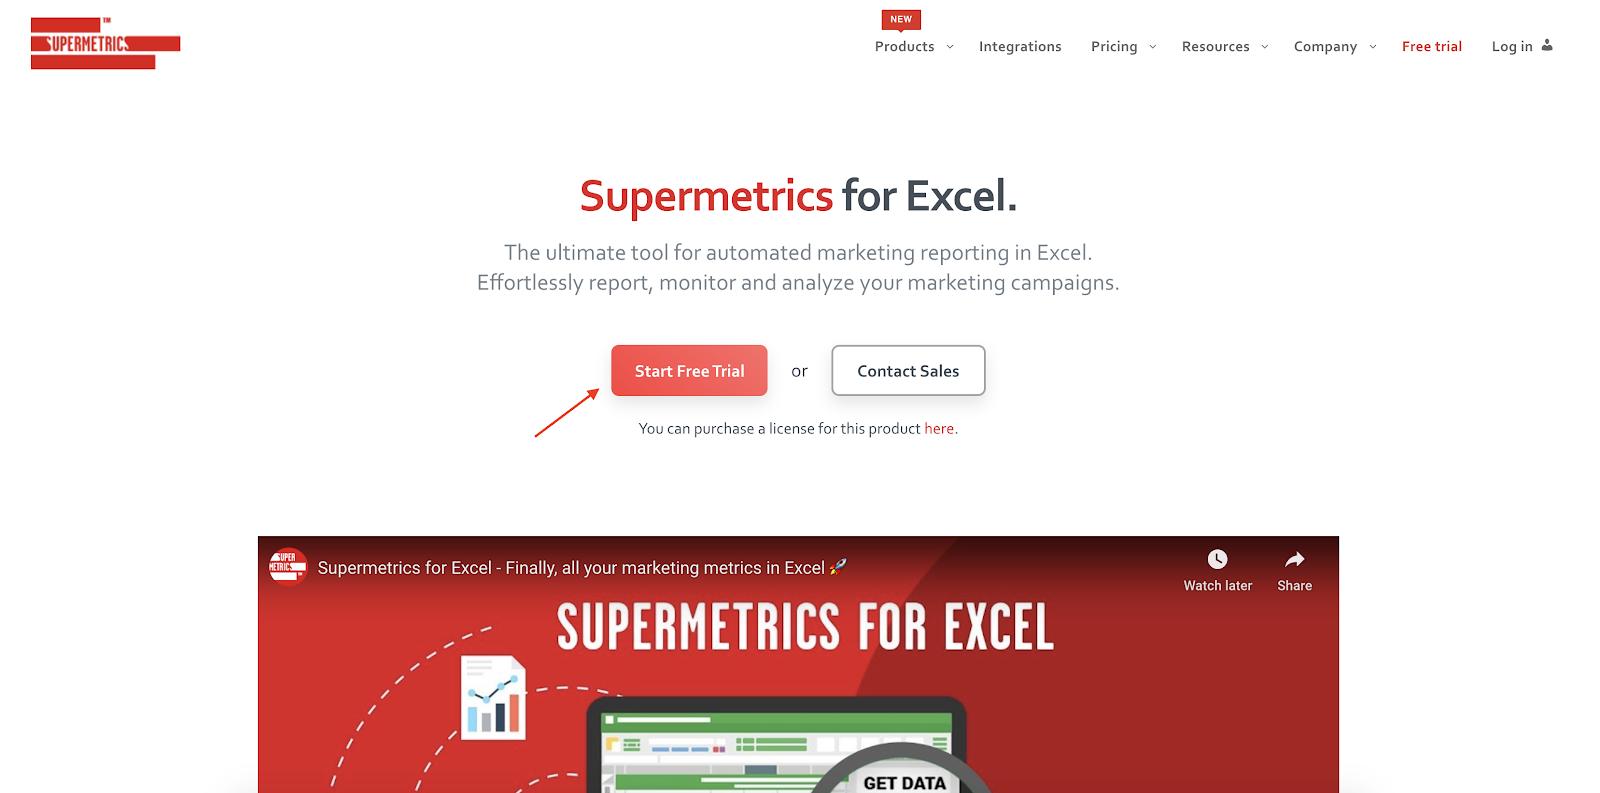 Supermetrics for Excel